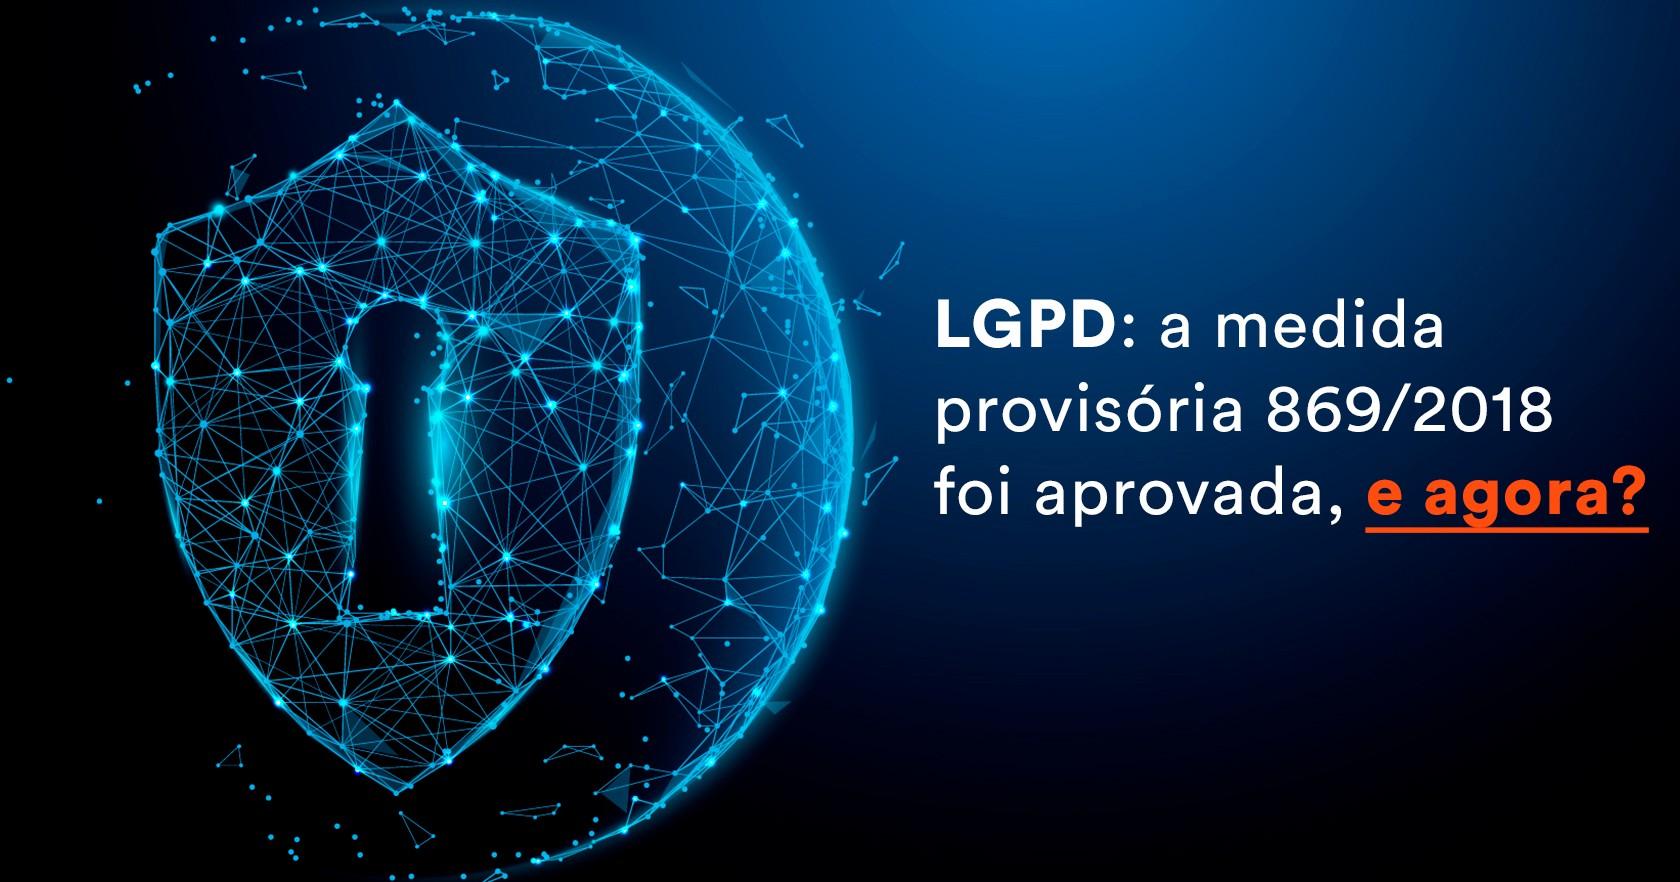 LGPD: a medida provisória 869/2018 foi aprovada, e agora?